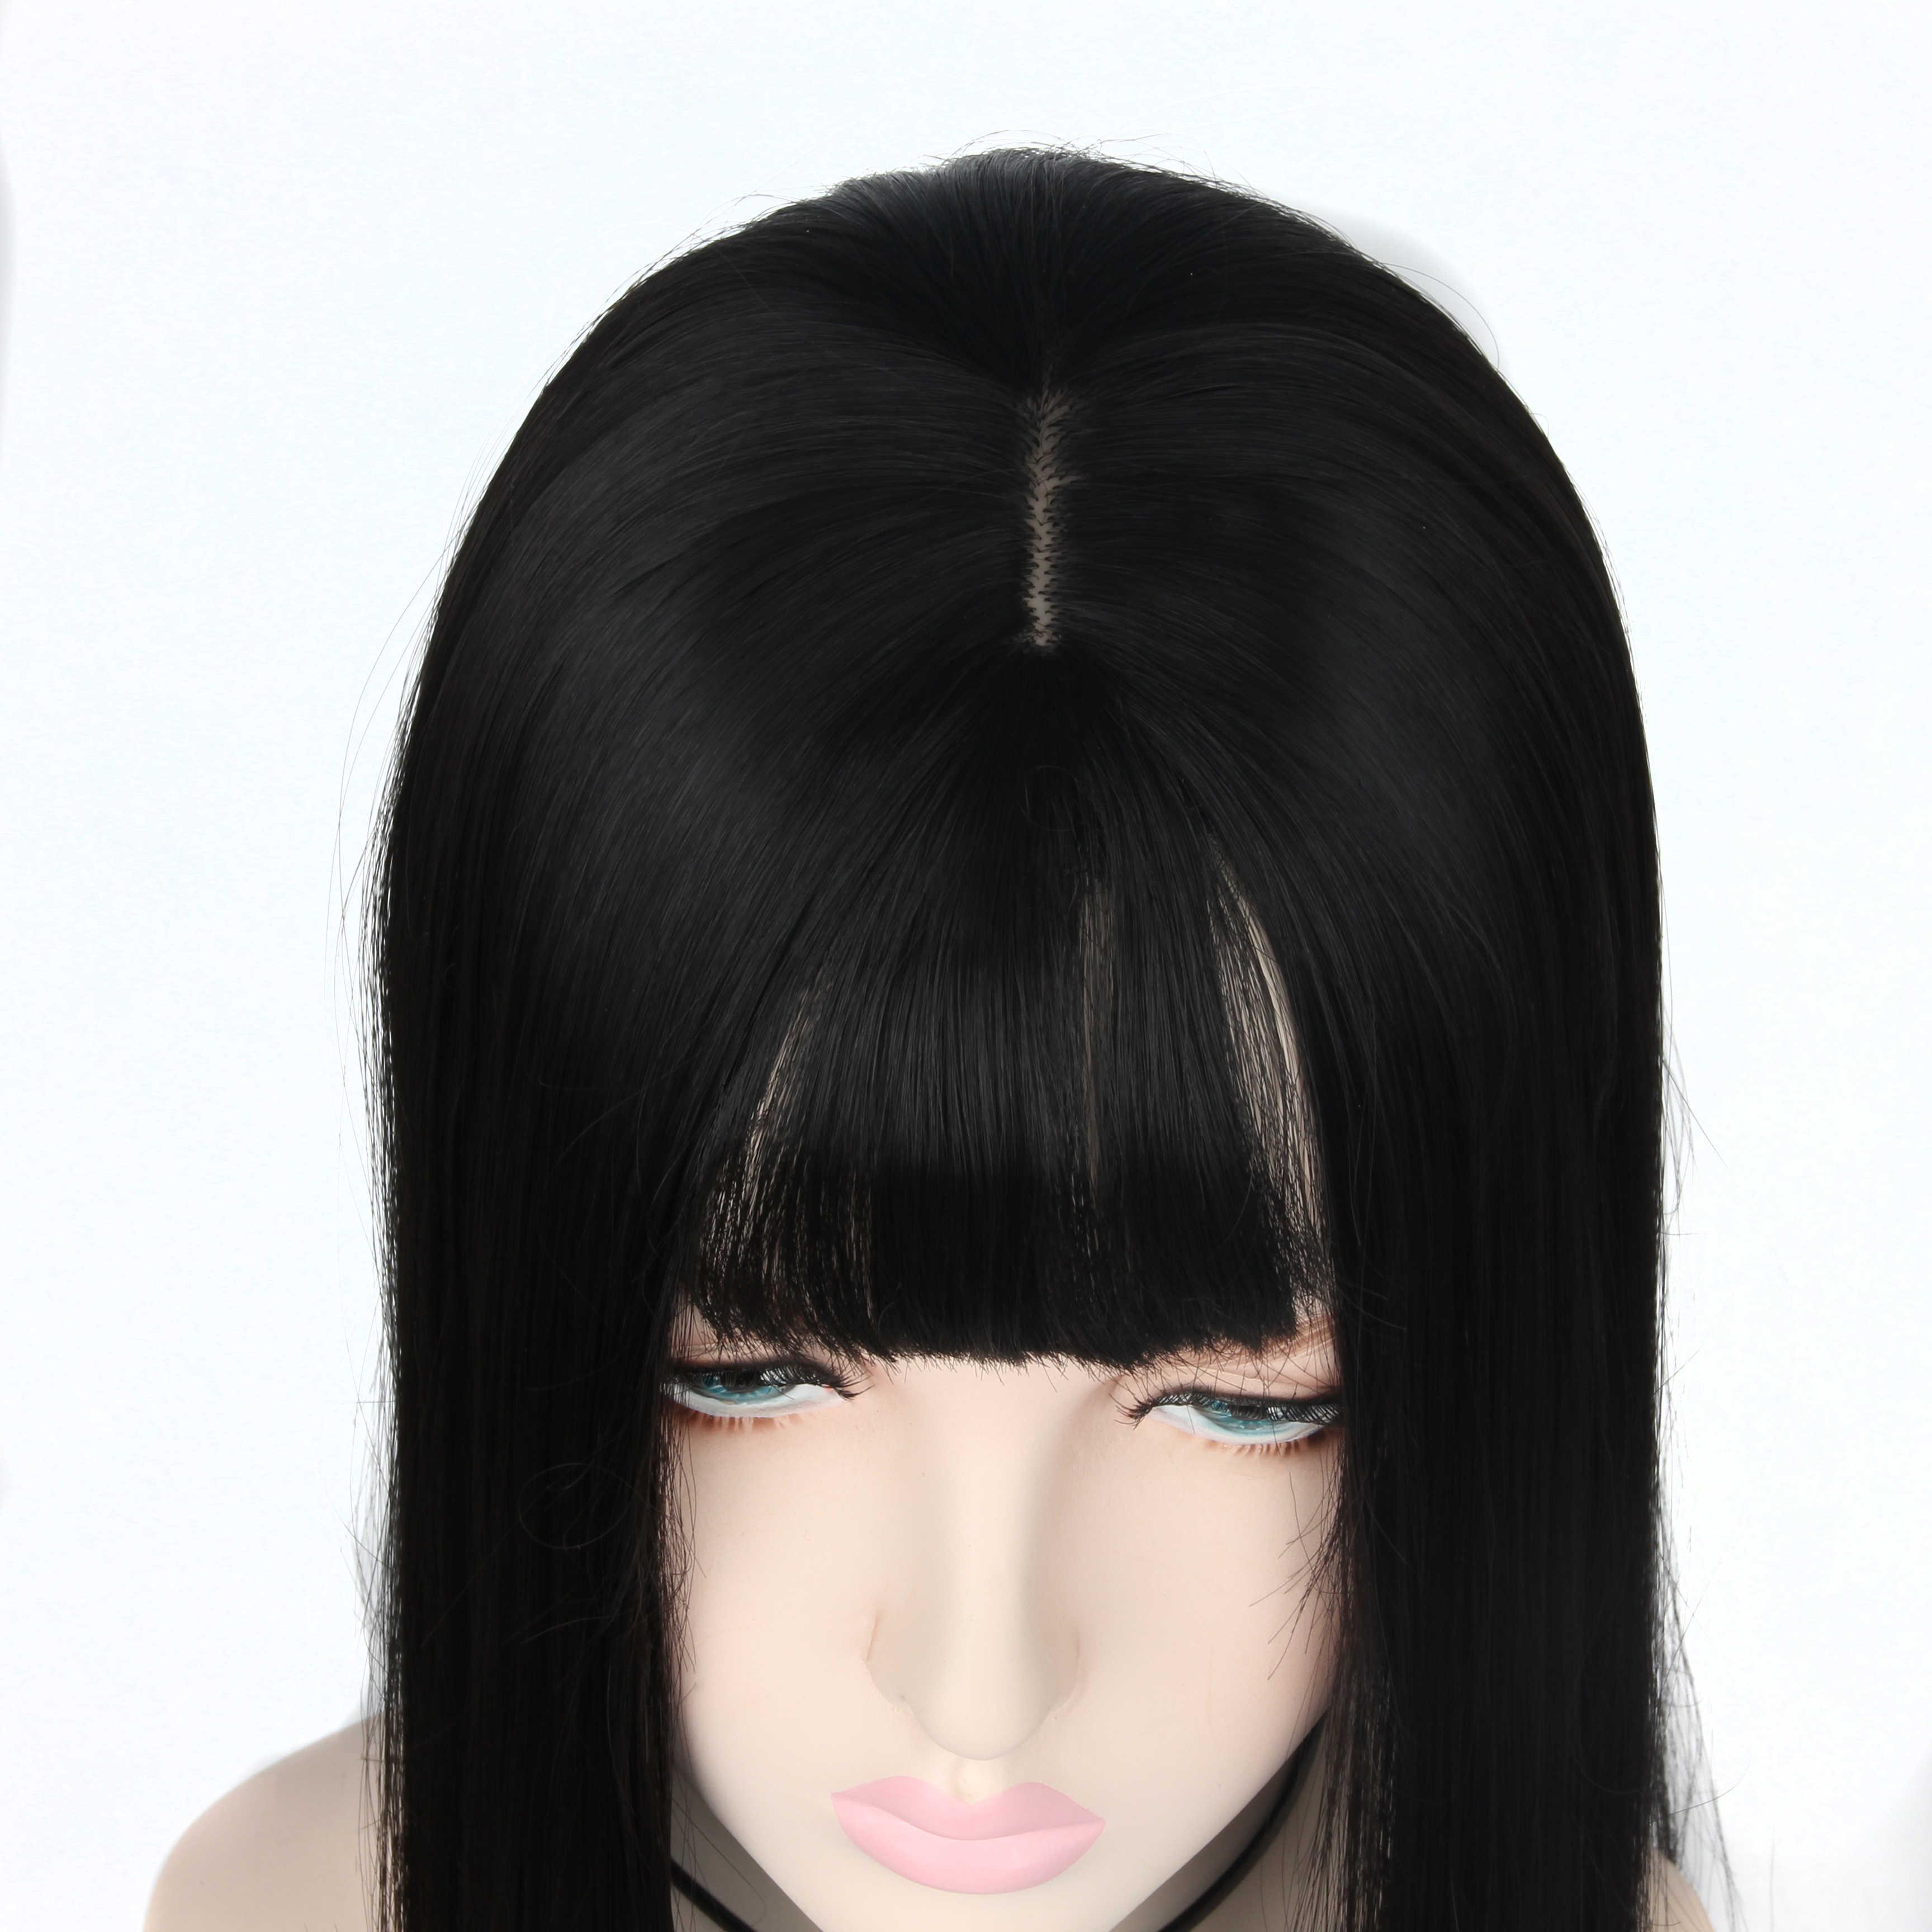 AIYEE Synthetische Haar Hand-made Natürliche Schwarz Topper Haarteil mit Pony Haar Stück Stück Toupet Gerade Haar